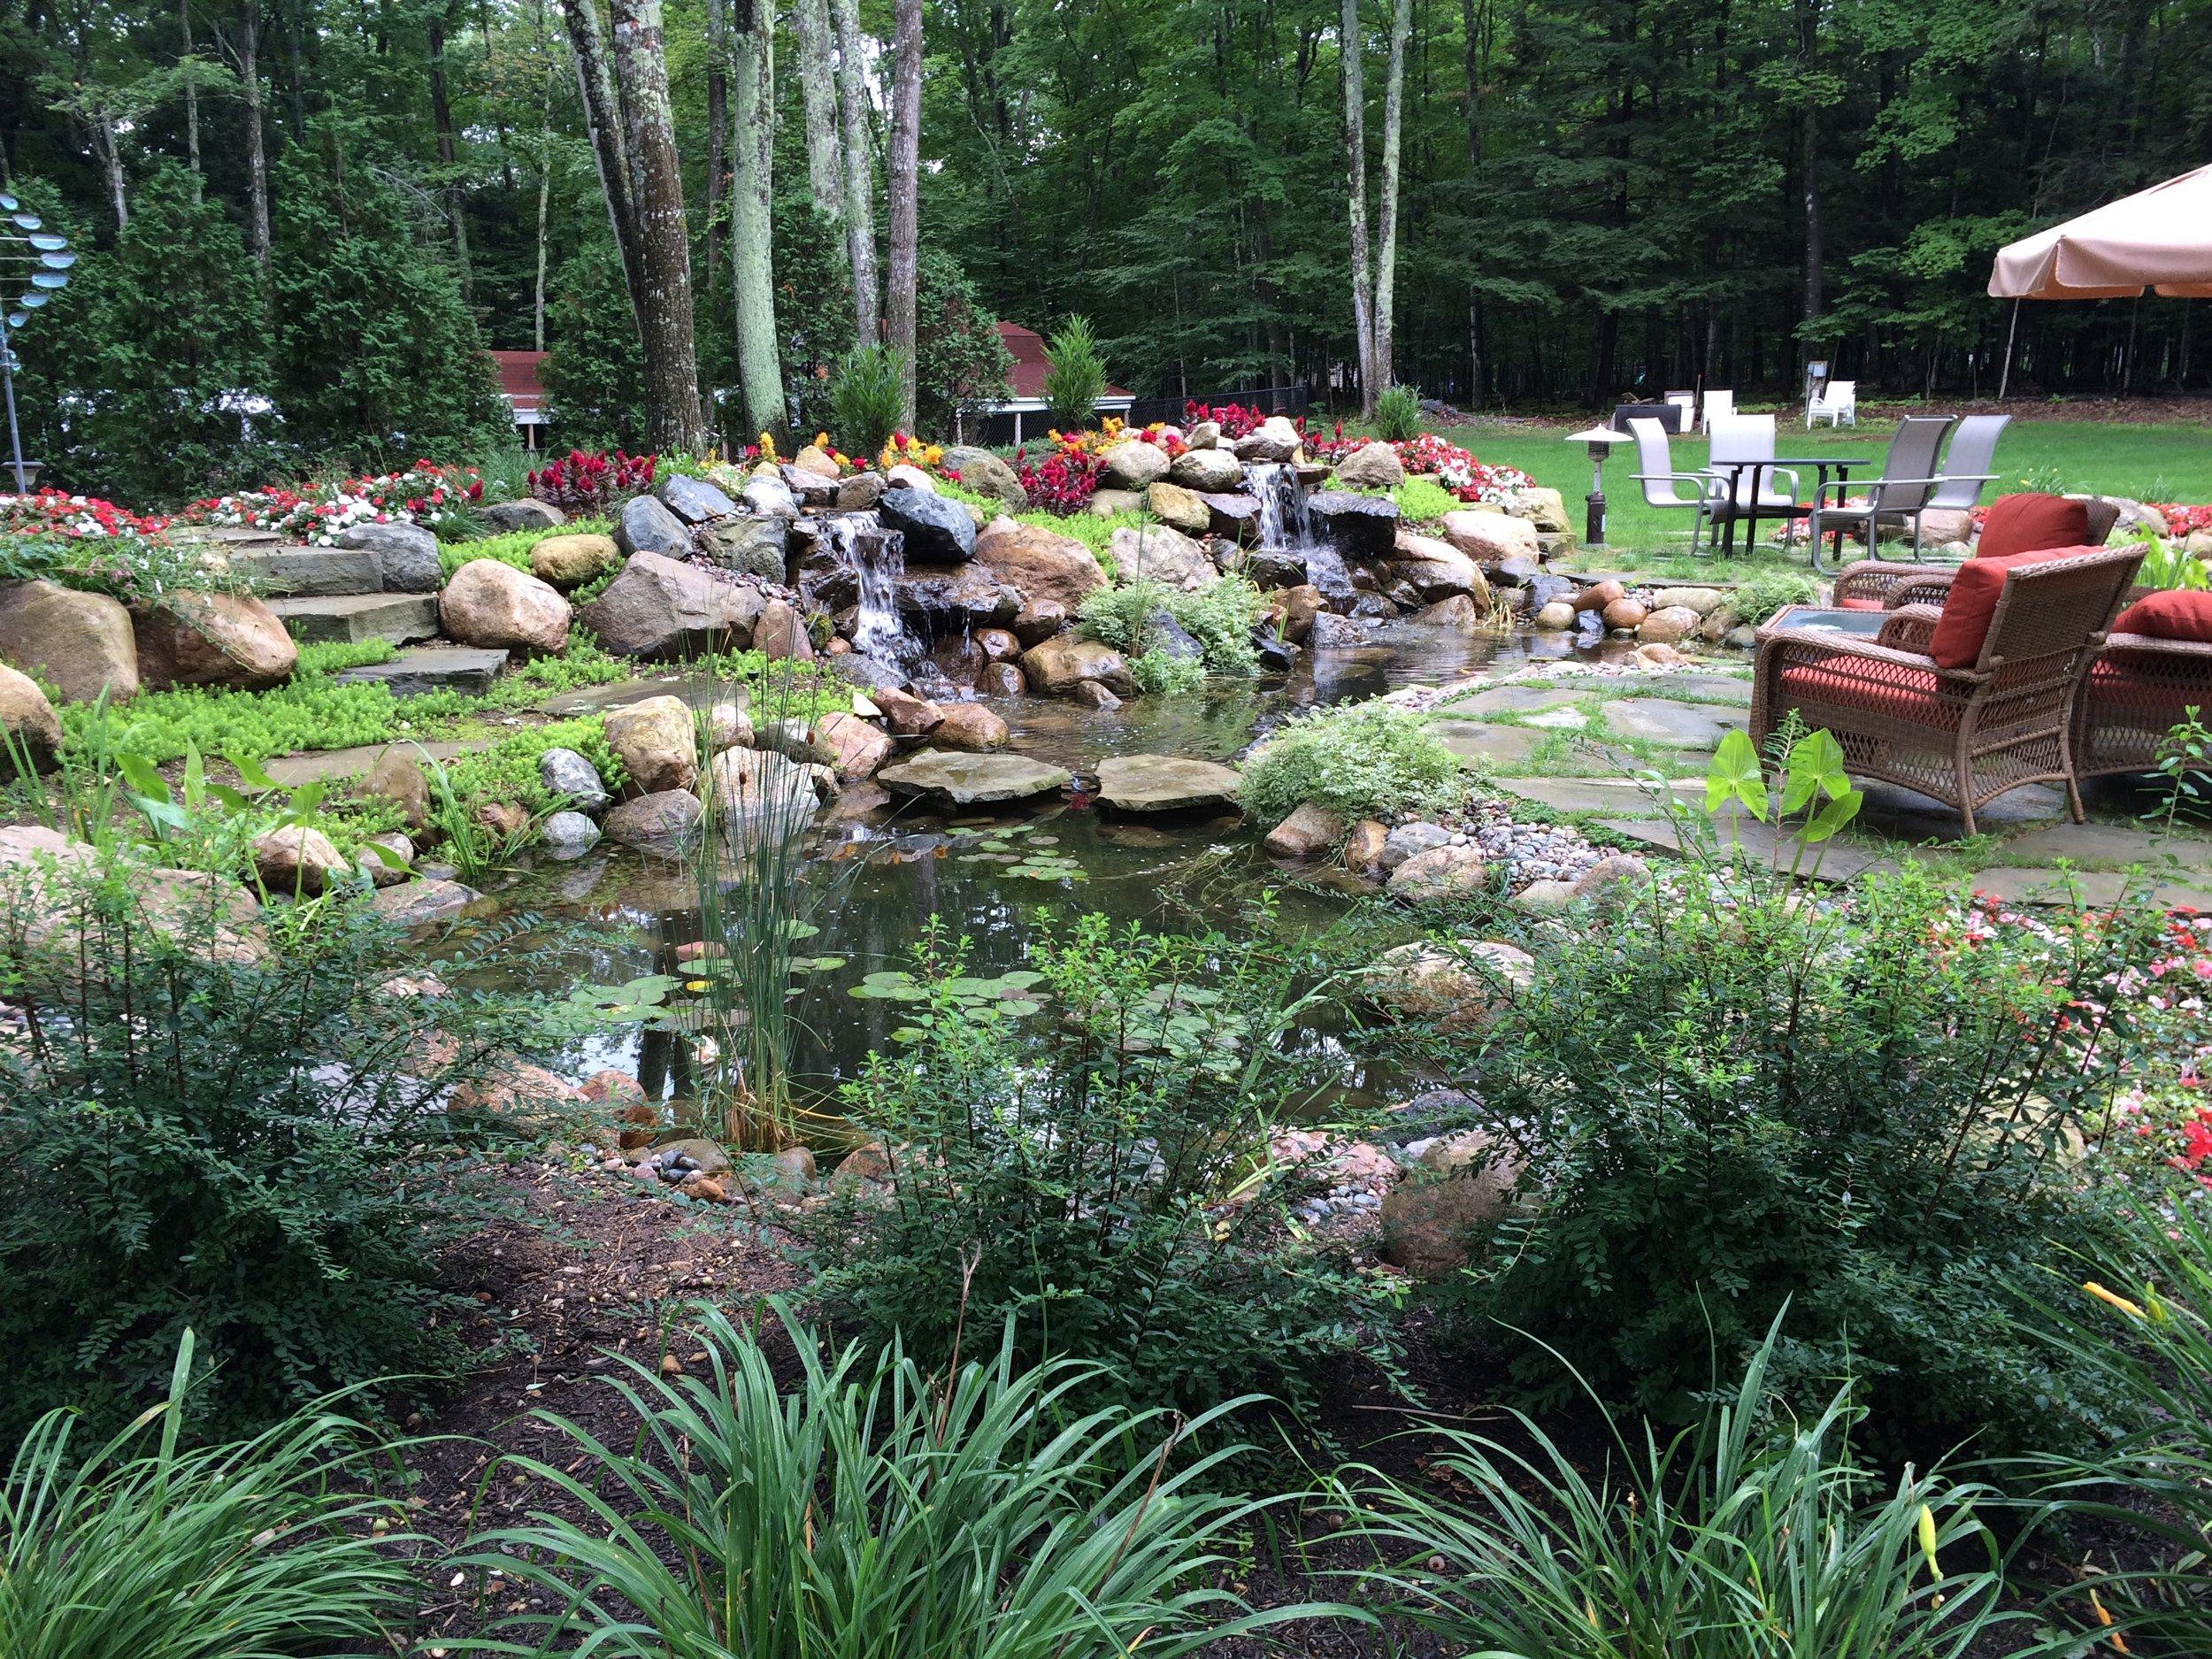 bELLAIRE, mi poND coNTRActors waterpaw gardens outdoor inspiration center design•build•supply•maintain•repair